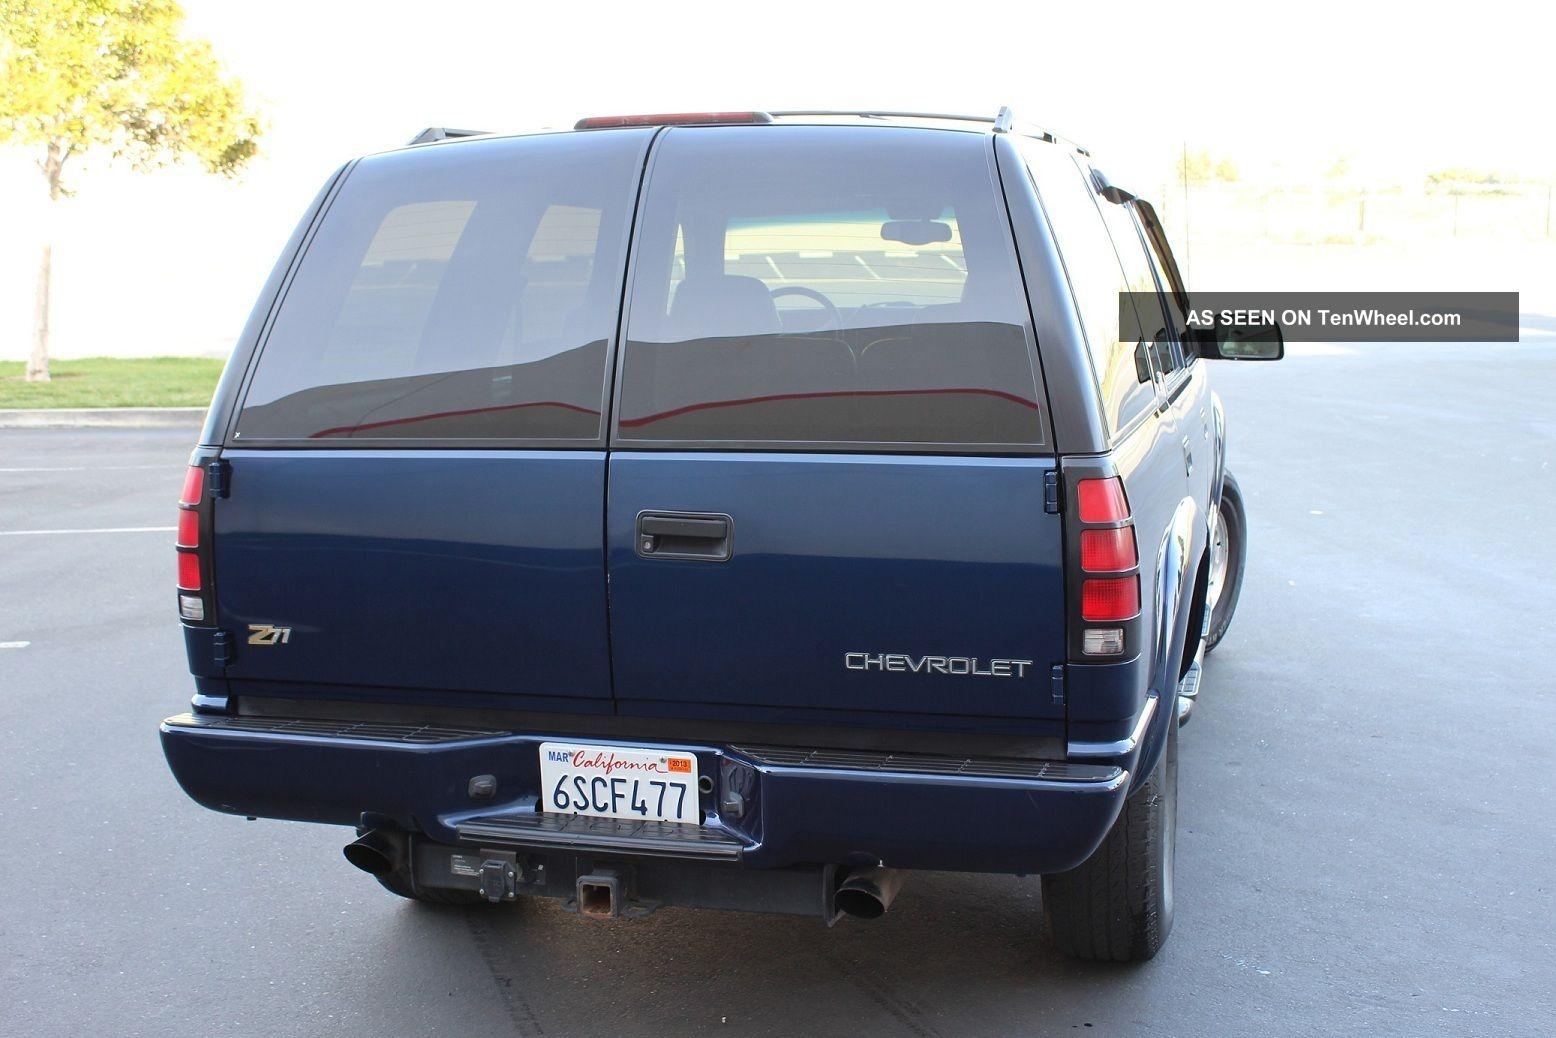 2000 Chevrolet Tahoe Z71 Excellent 4x4 Off Road